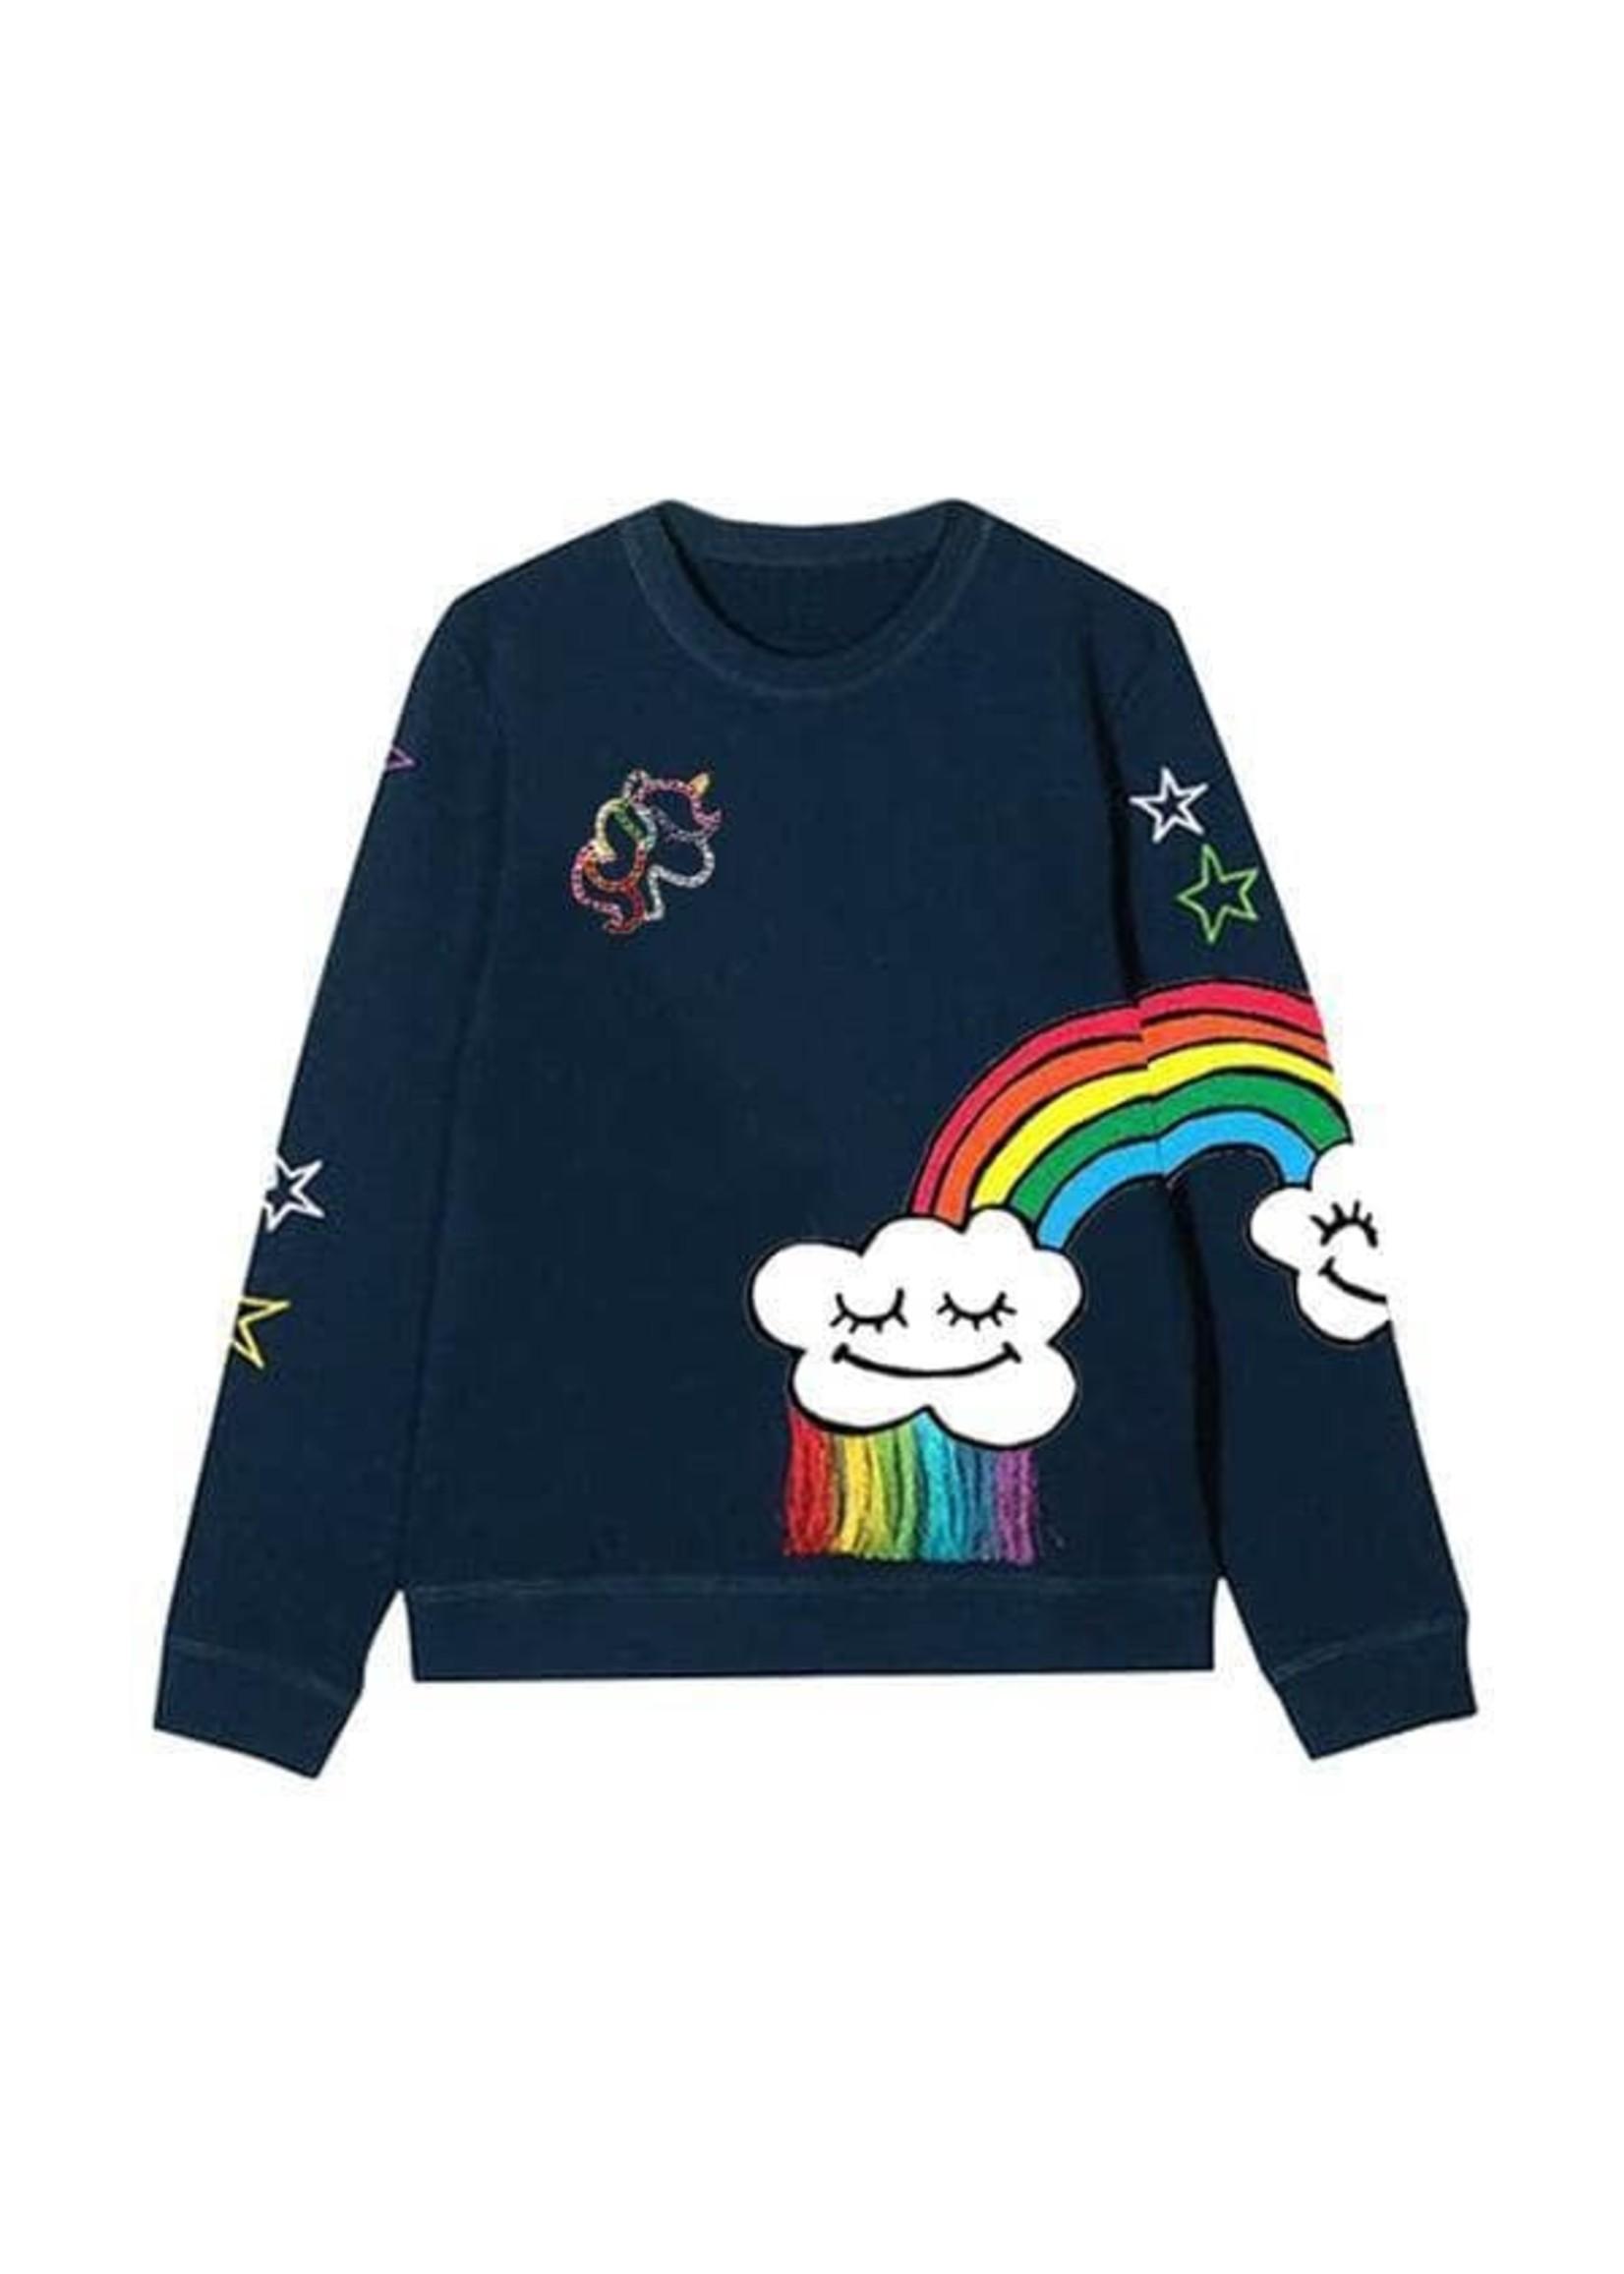 Smiley Cloud Sweatshirt